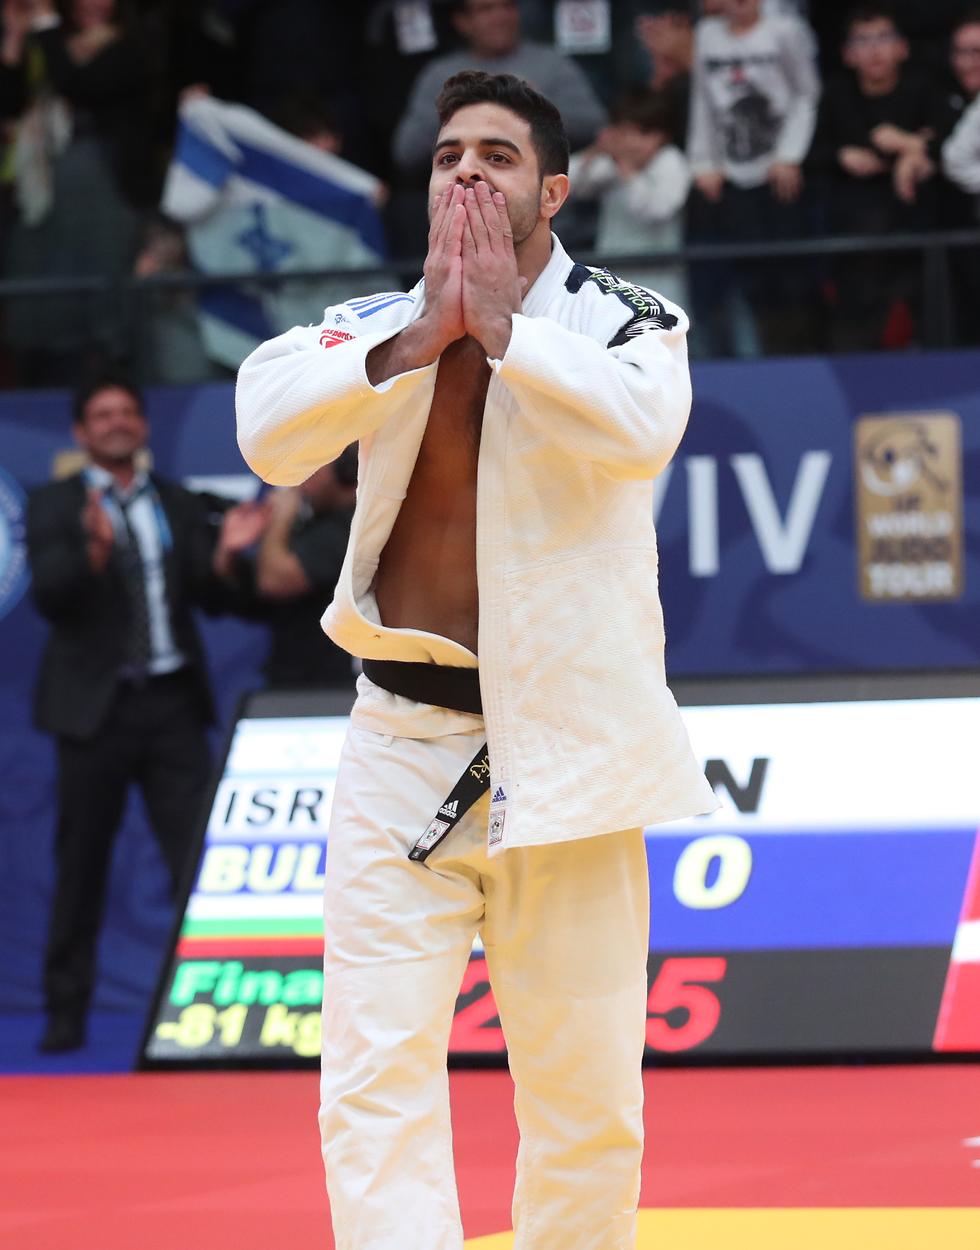 Israeli Judoka Sagi Muki (Photo: Oren Aharoni)